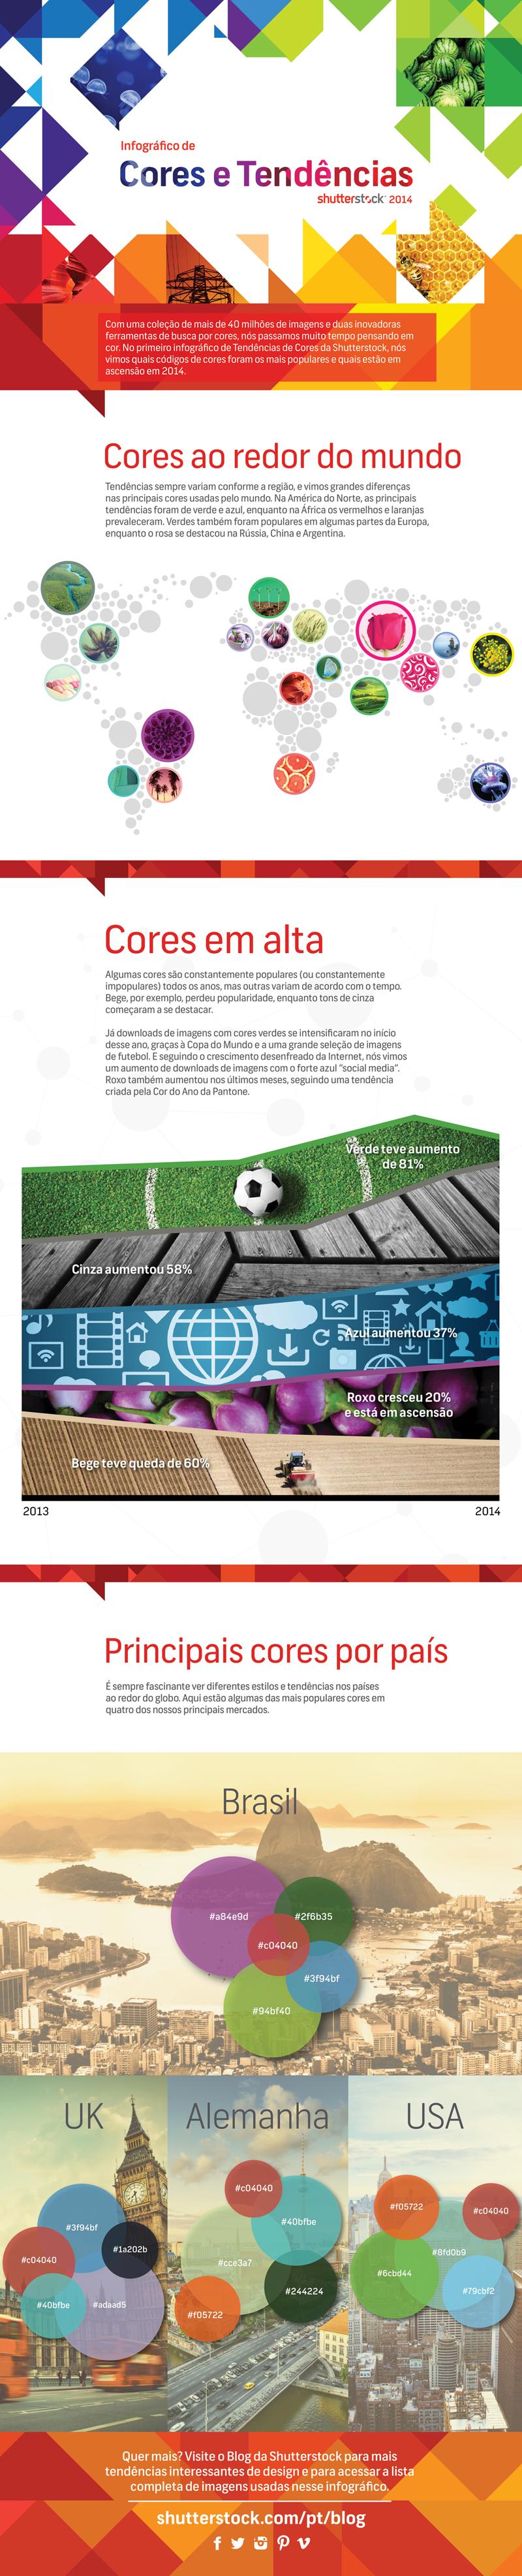 Tendências de Cores: Infográfico